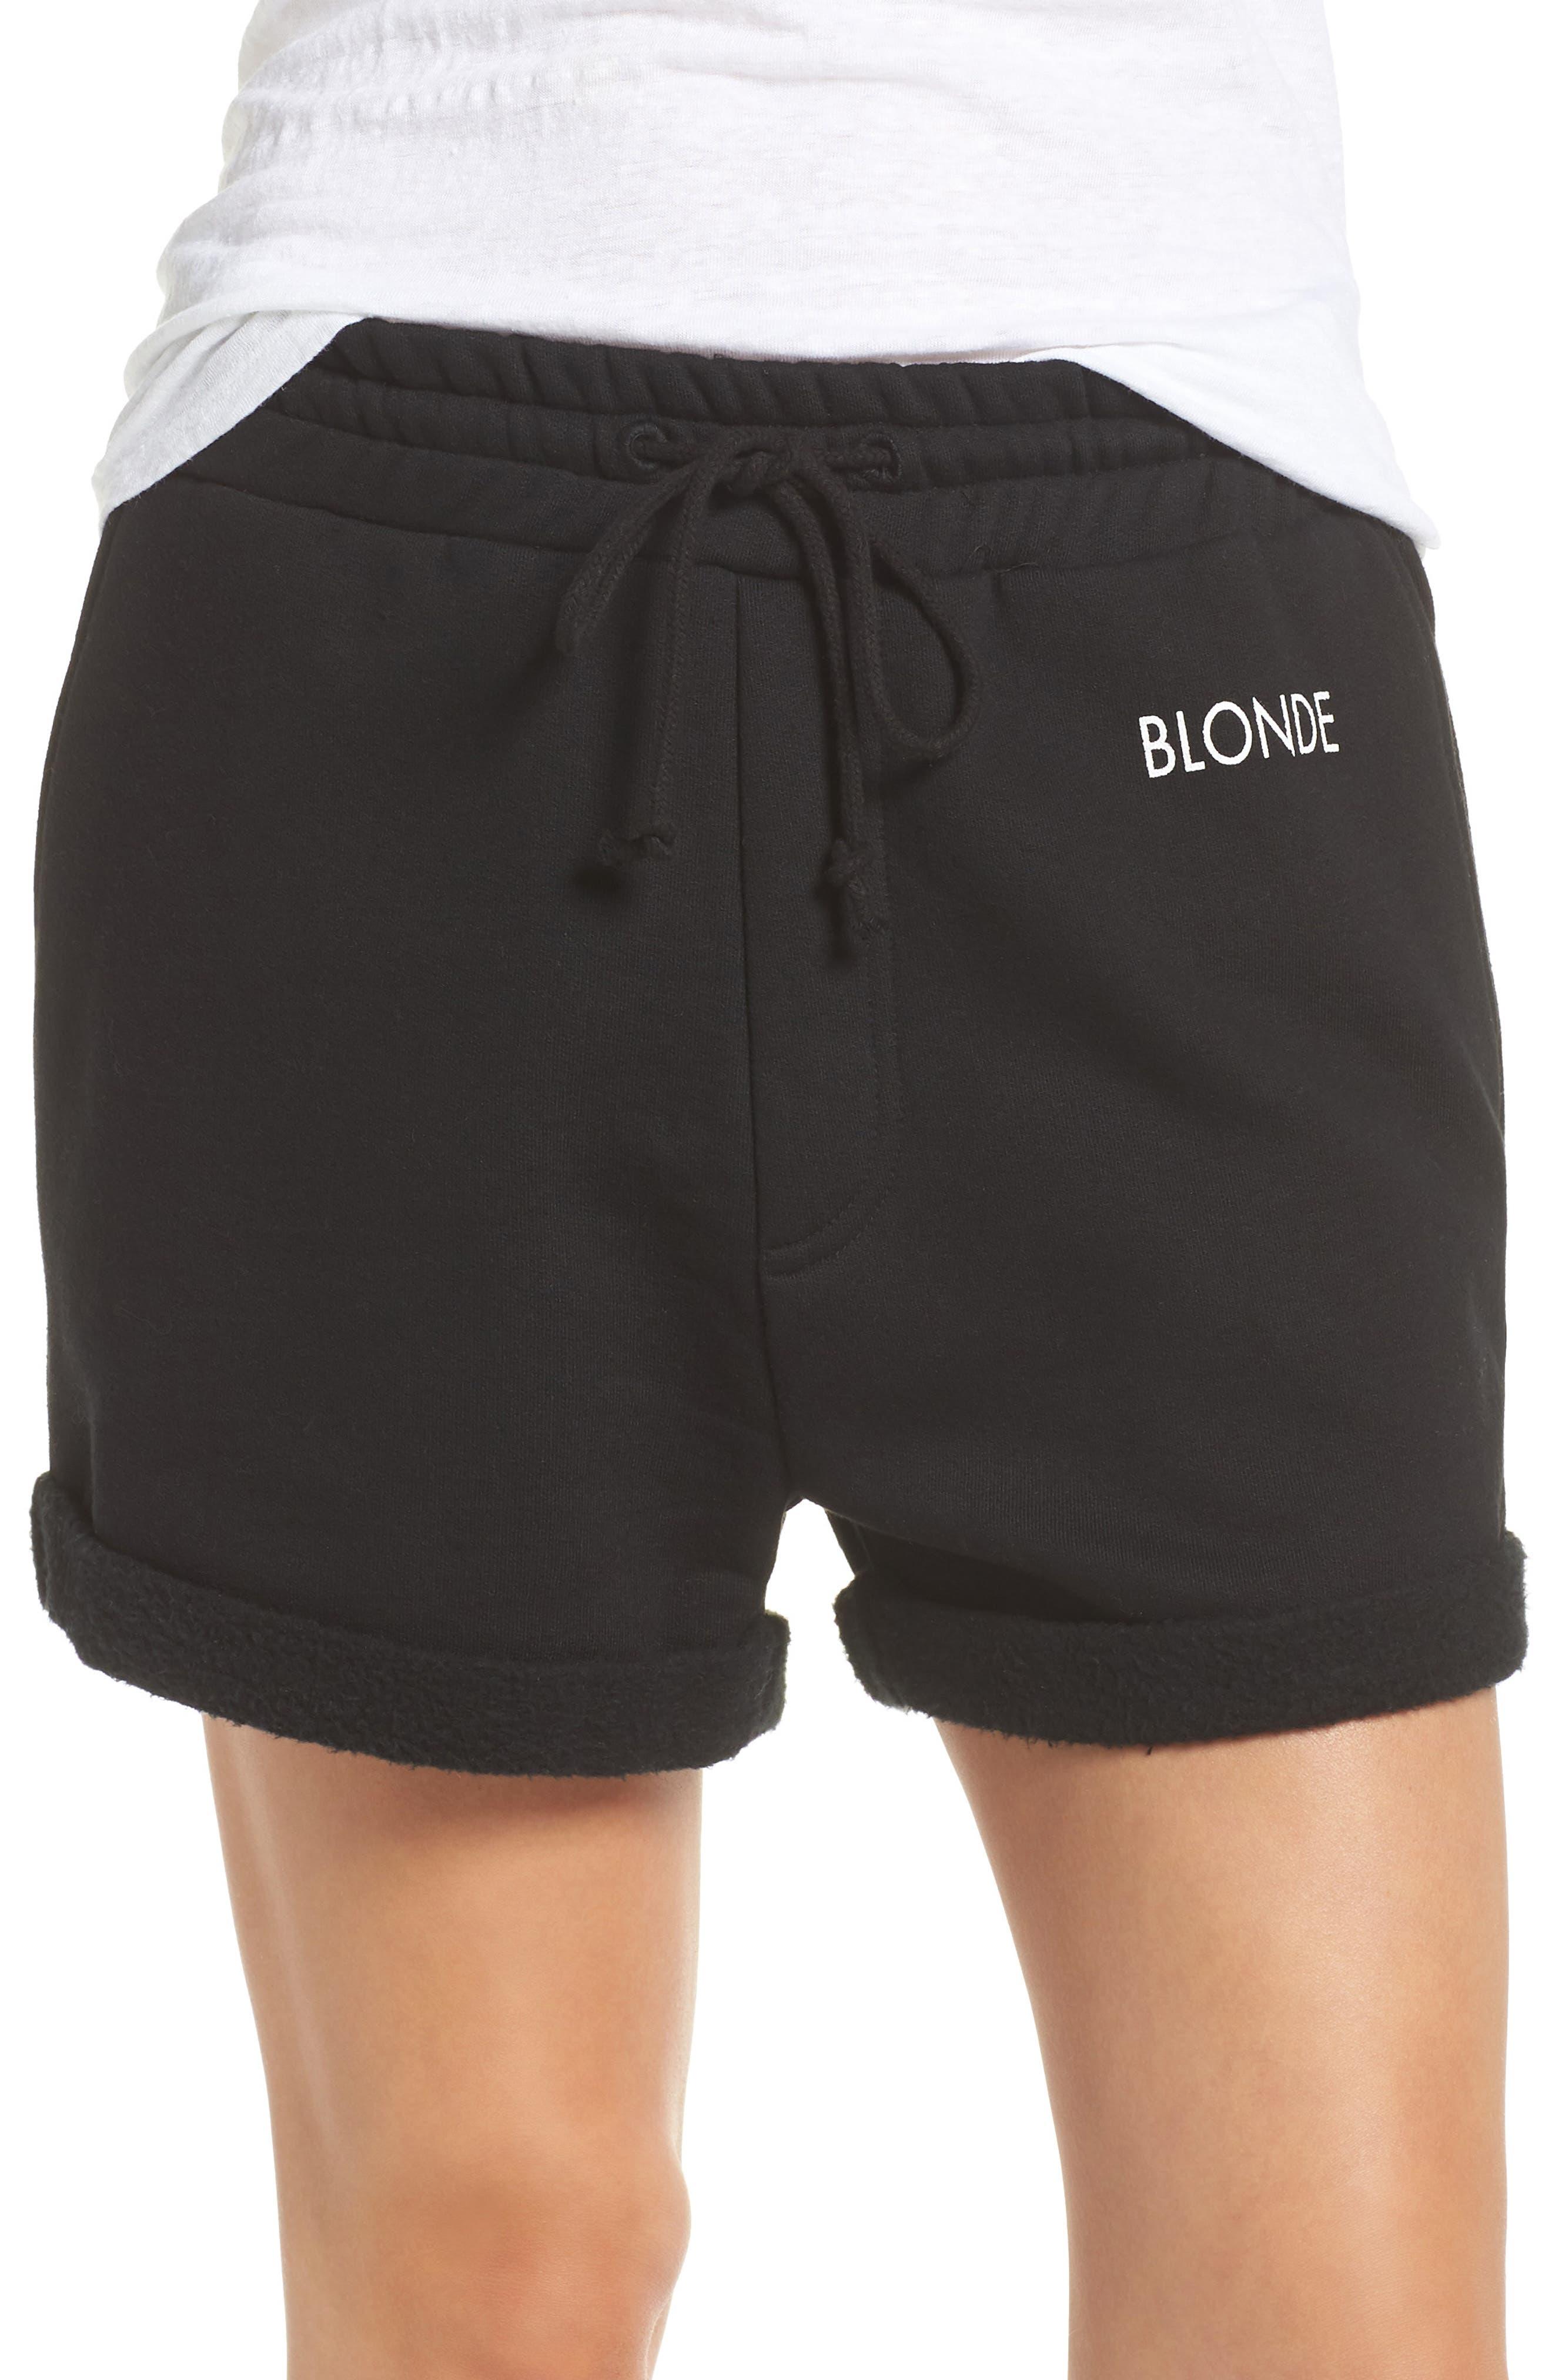 Blonde Lounge Shorts,                         Main,                         color, Black